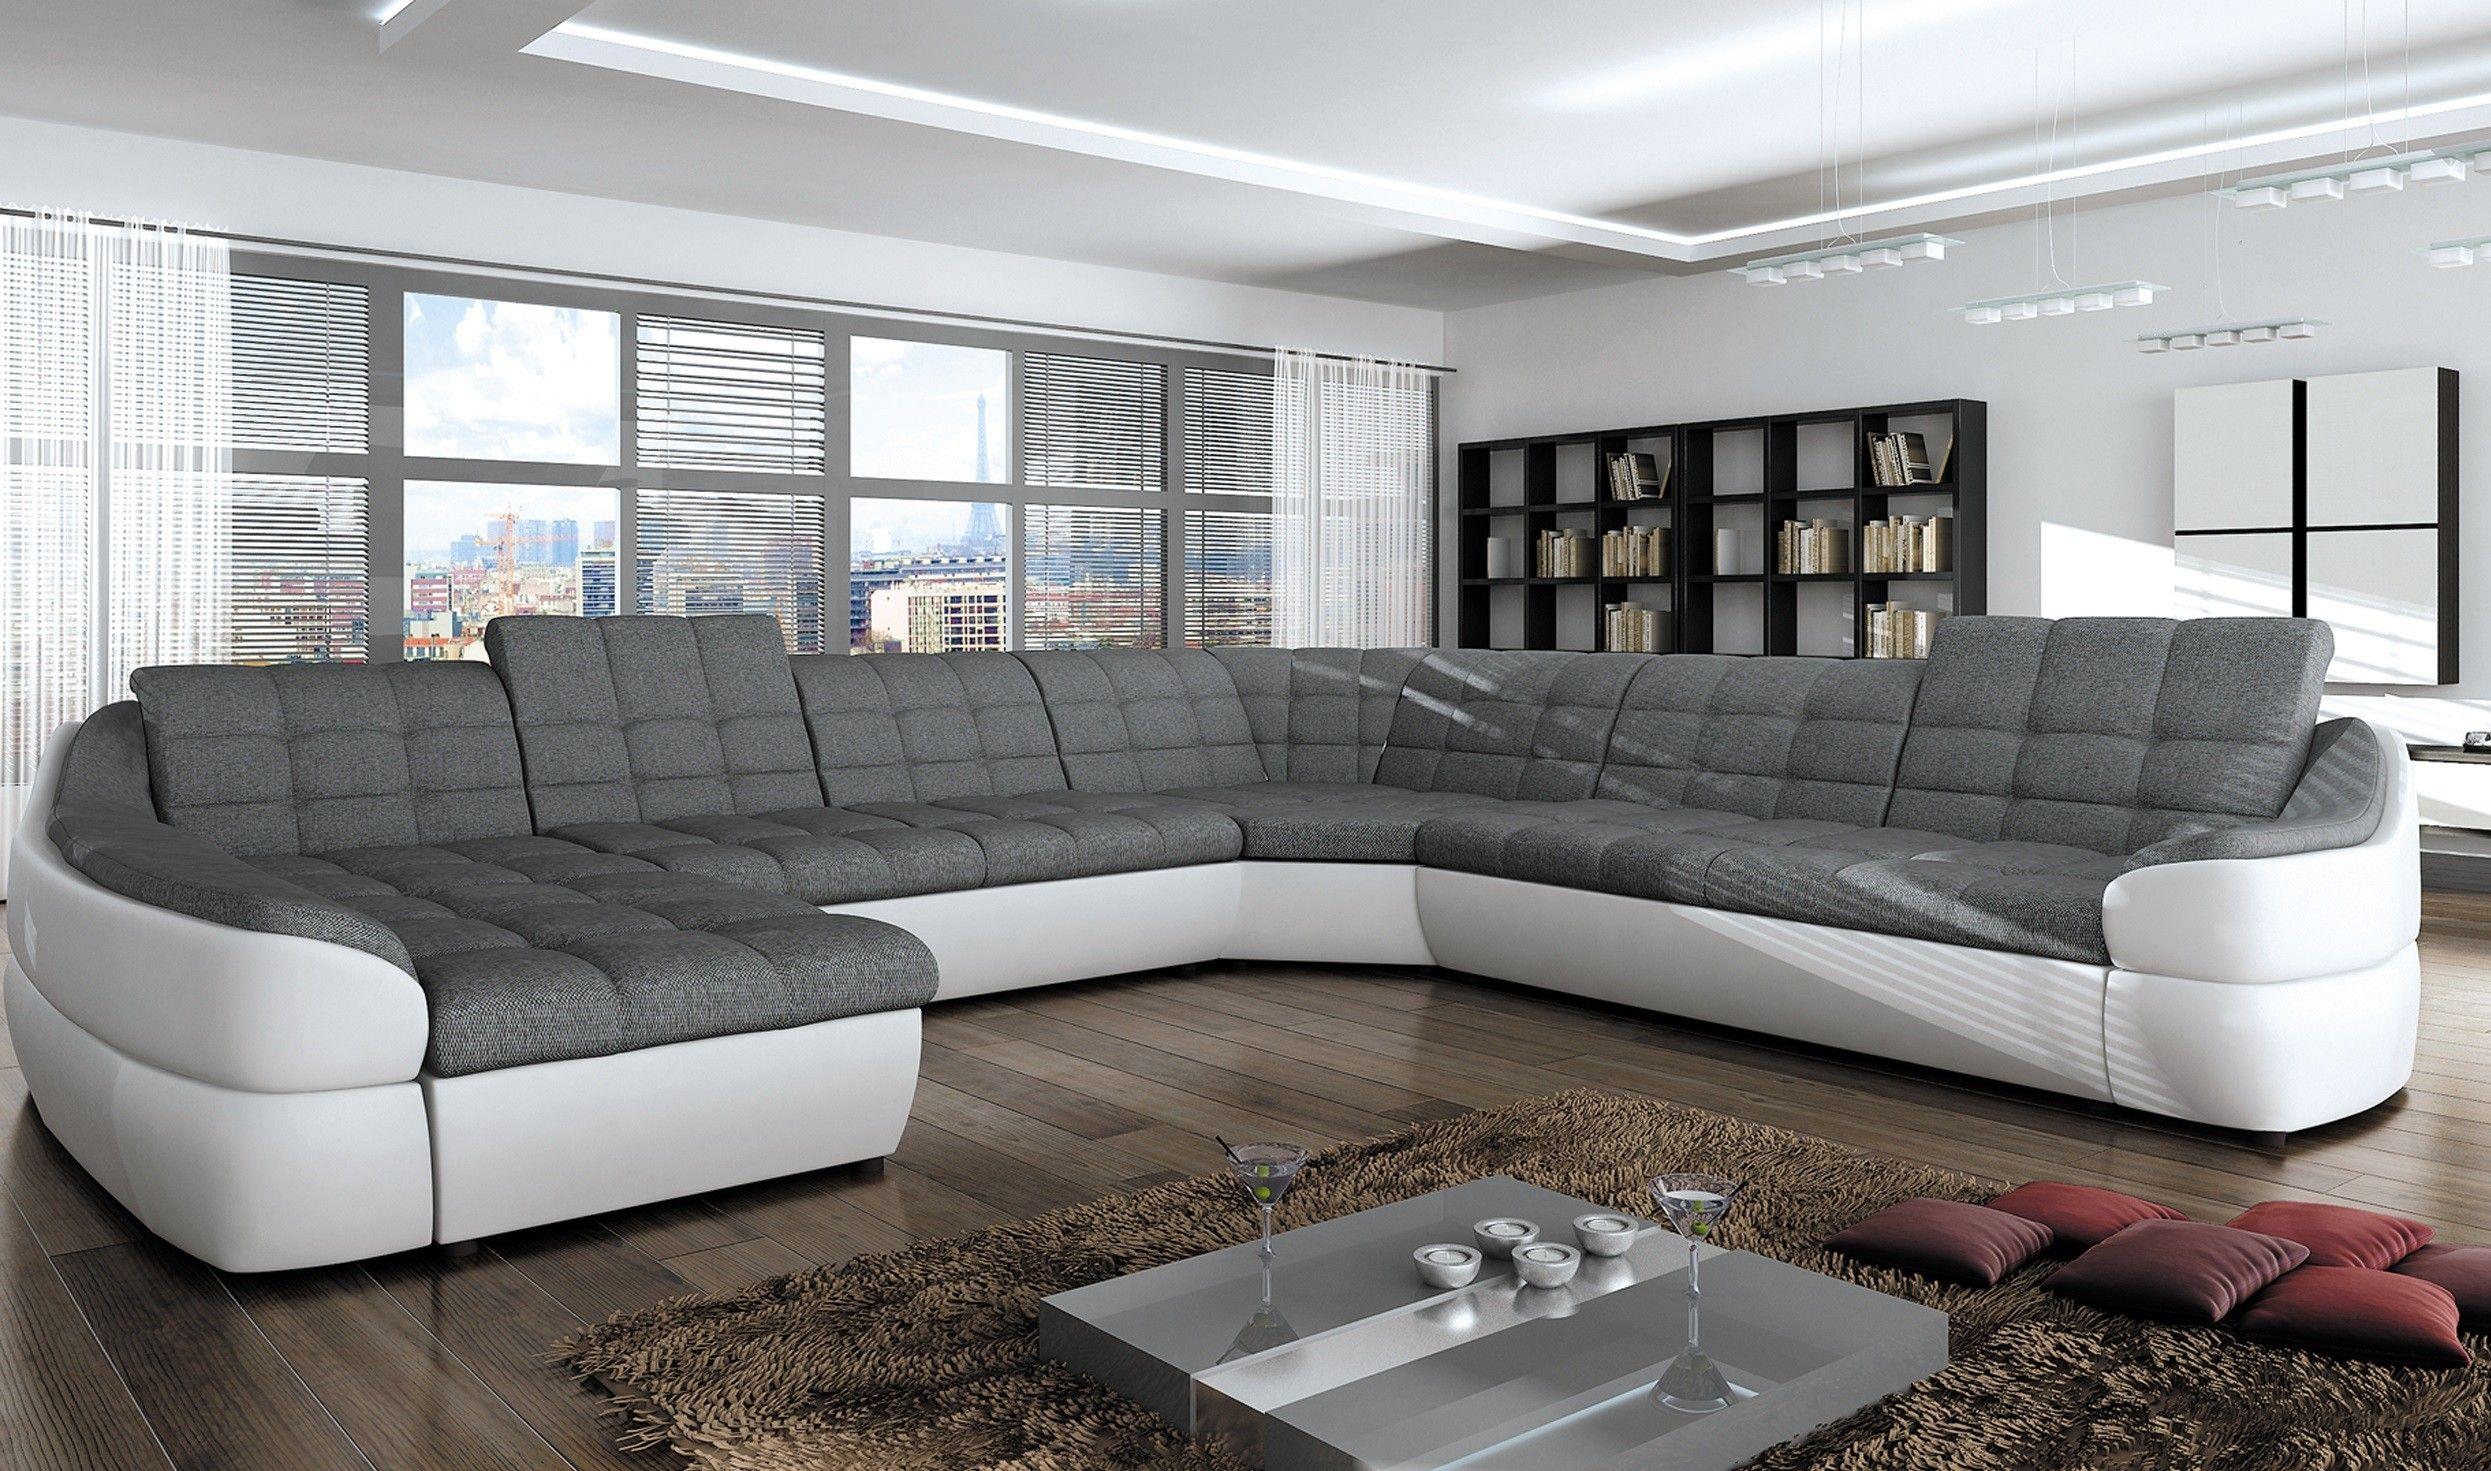 Afficher l\'image d\'origine | Modern sofa | Pinterest | Modern chairs ...